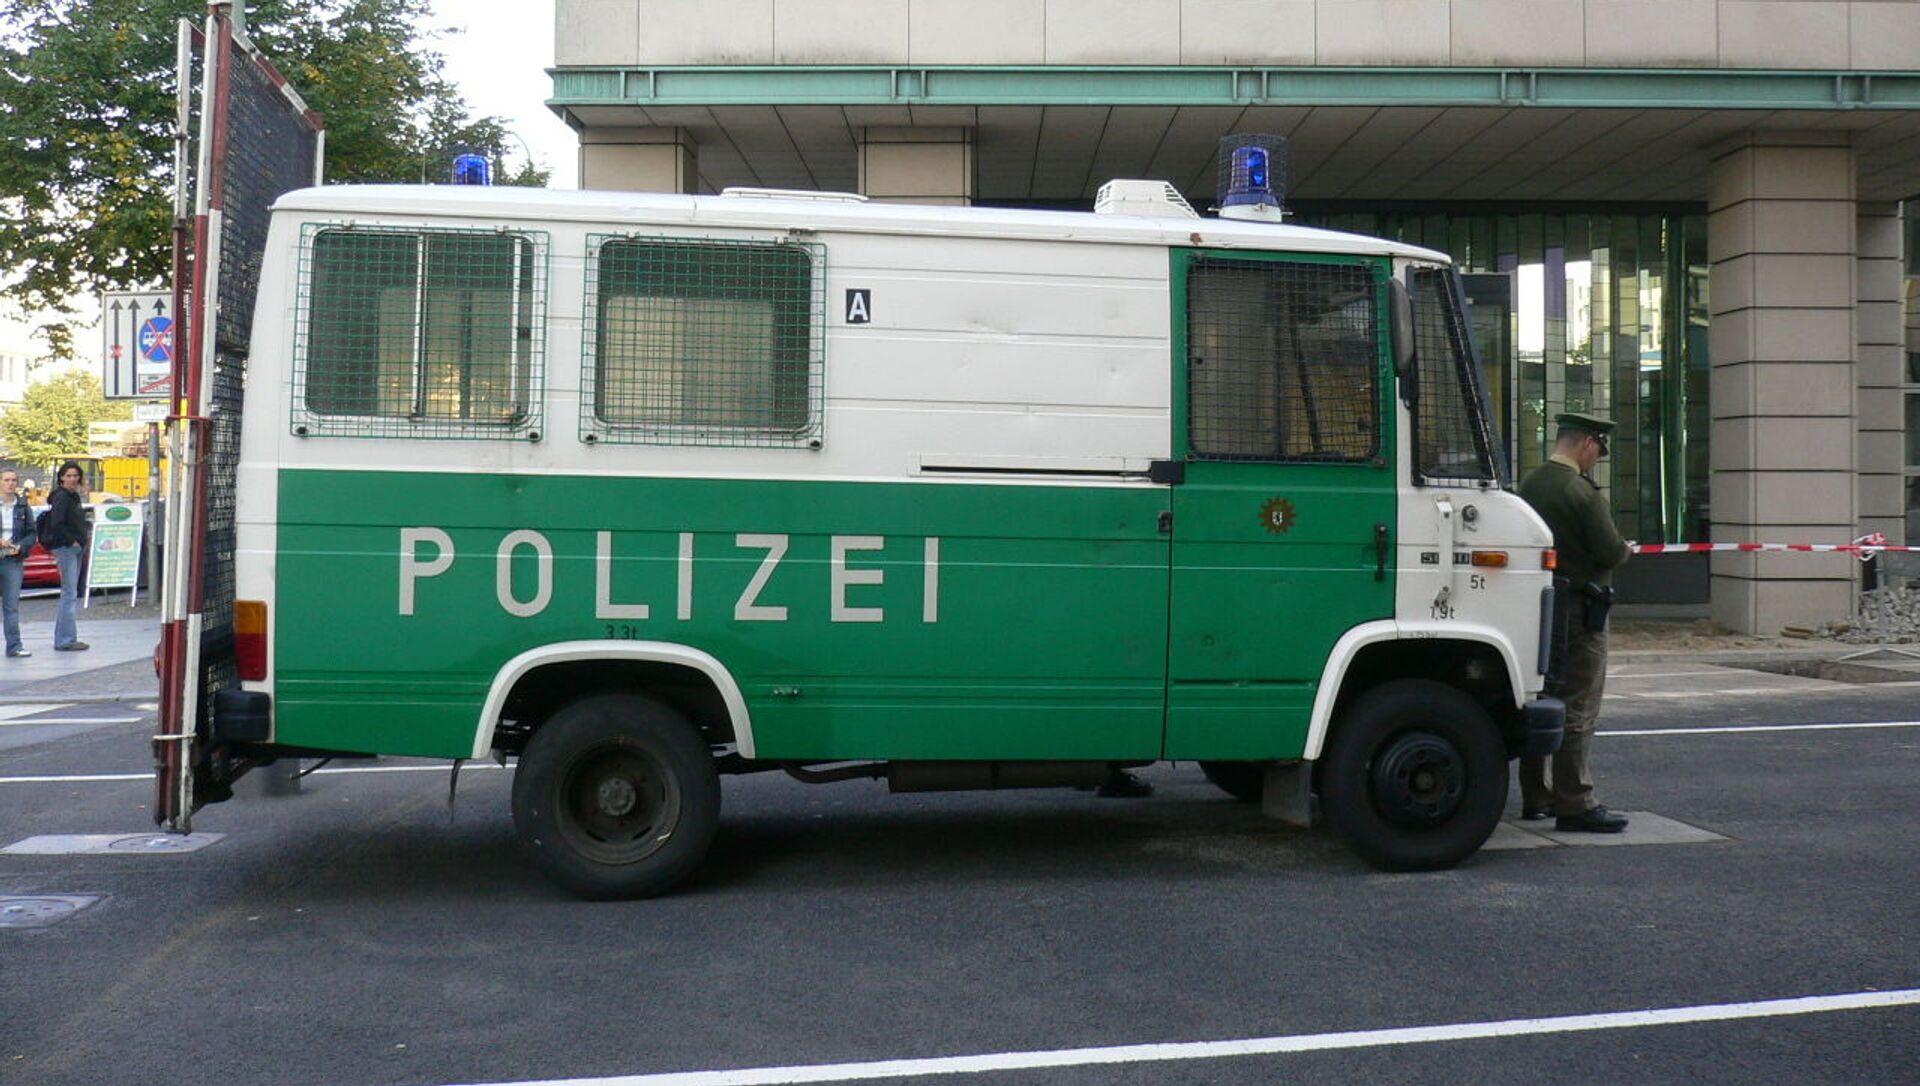 Un véhicule de police à Berlin (image d'illustration) - Sputnik France, 1920, 30.07.2021